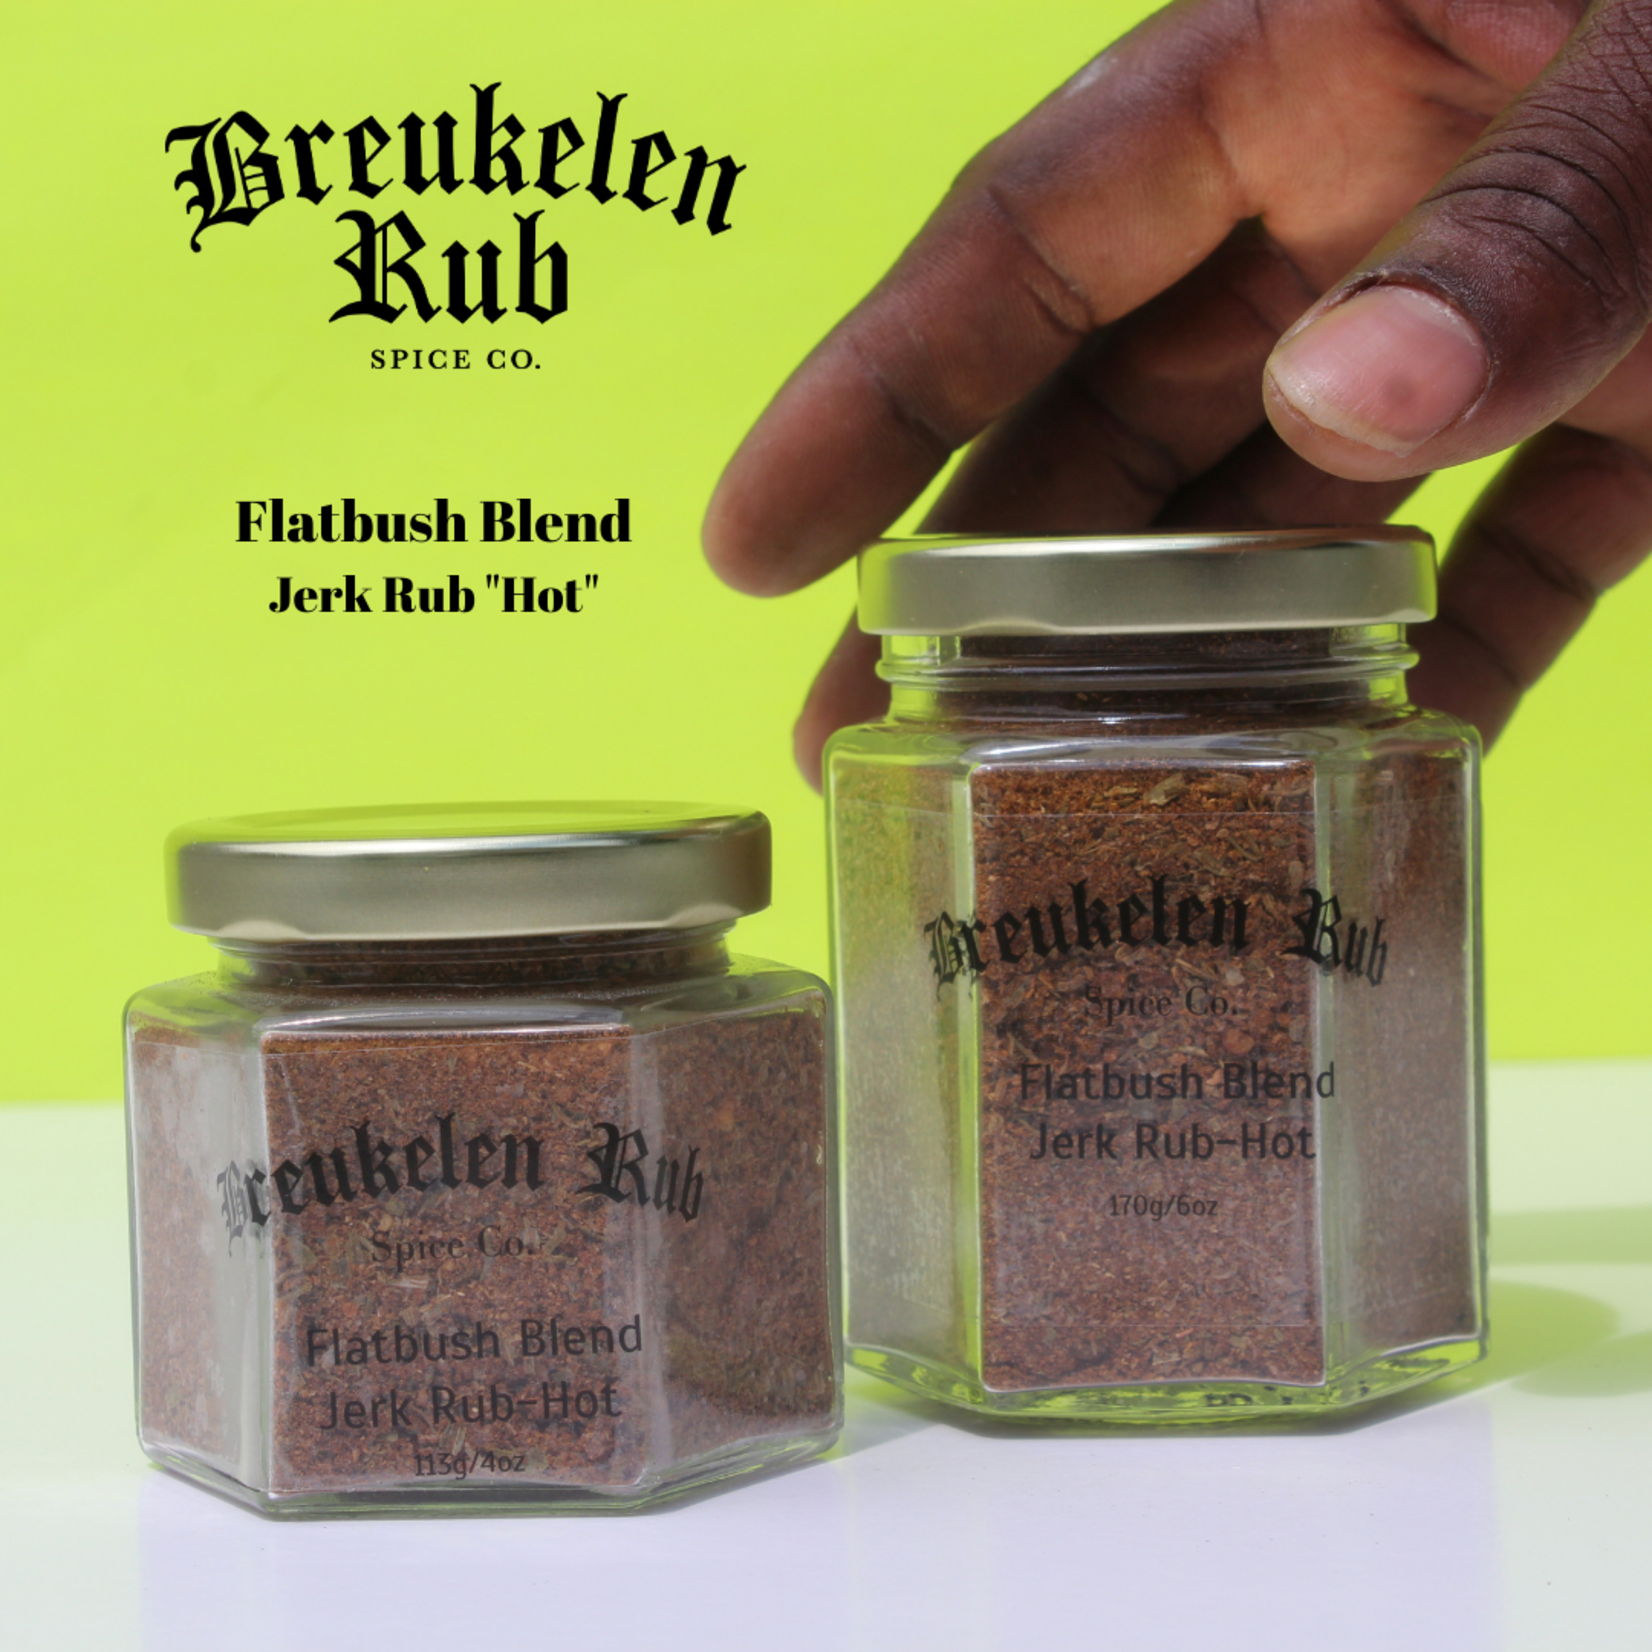 Flatbush Mild Breukelen Rub